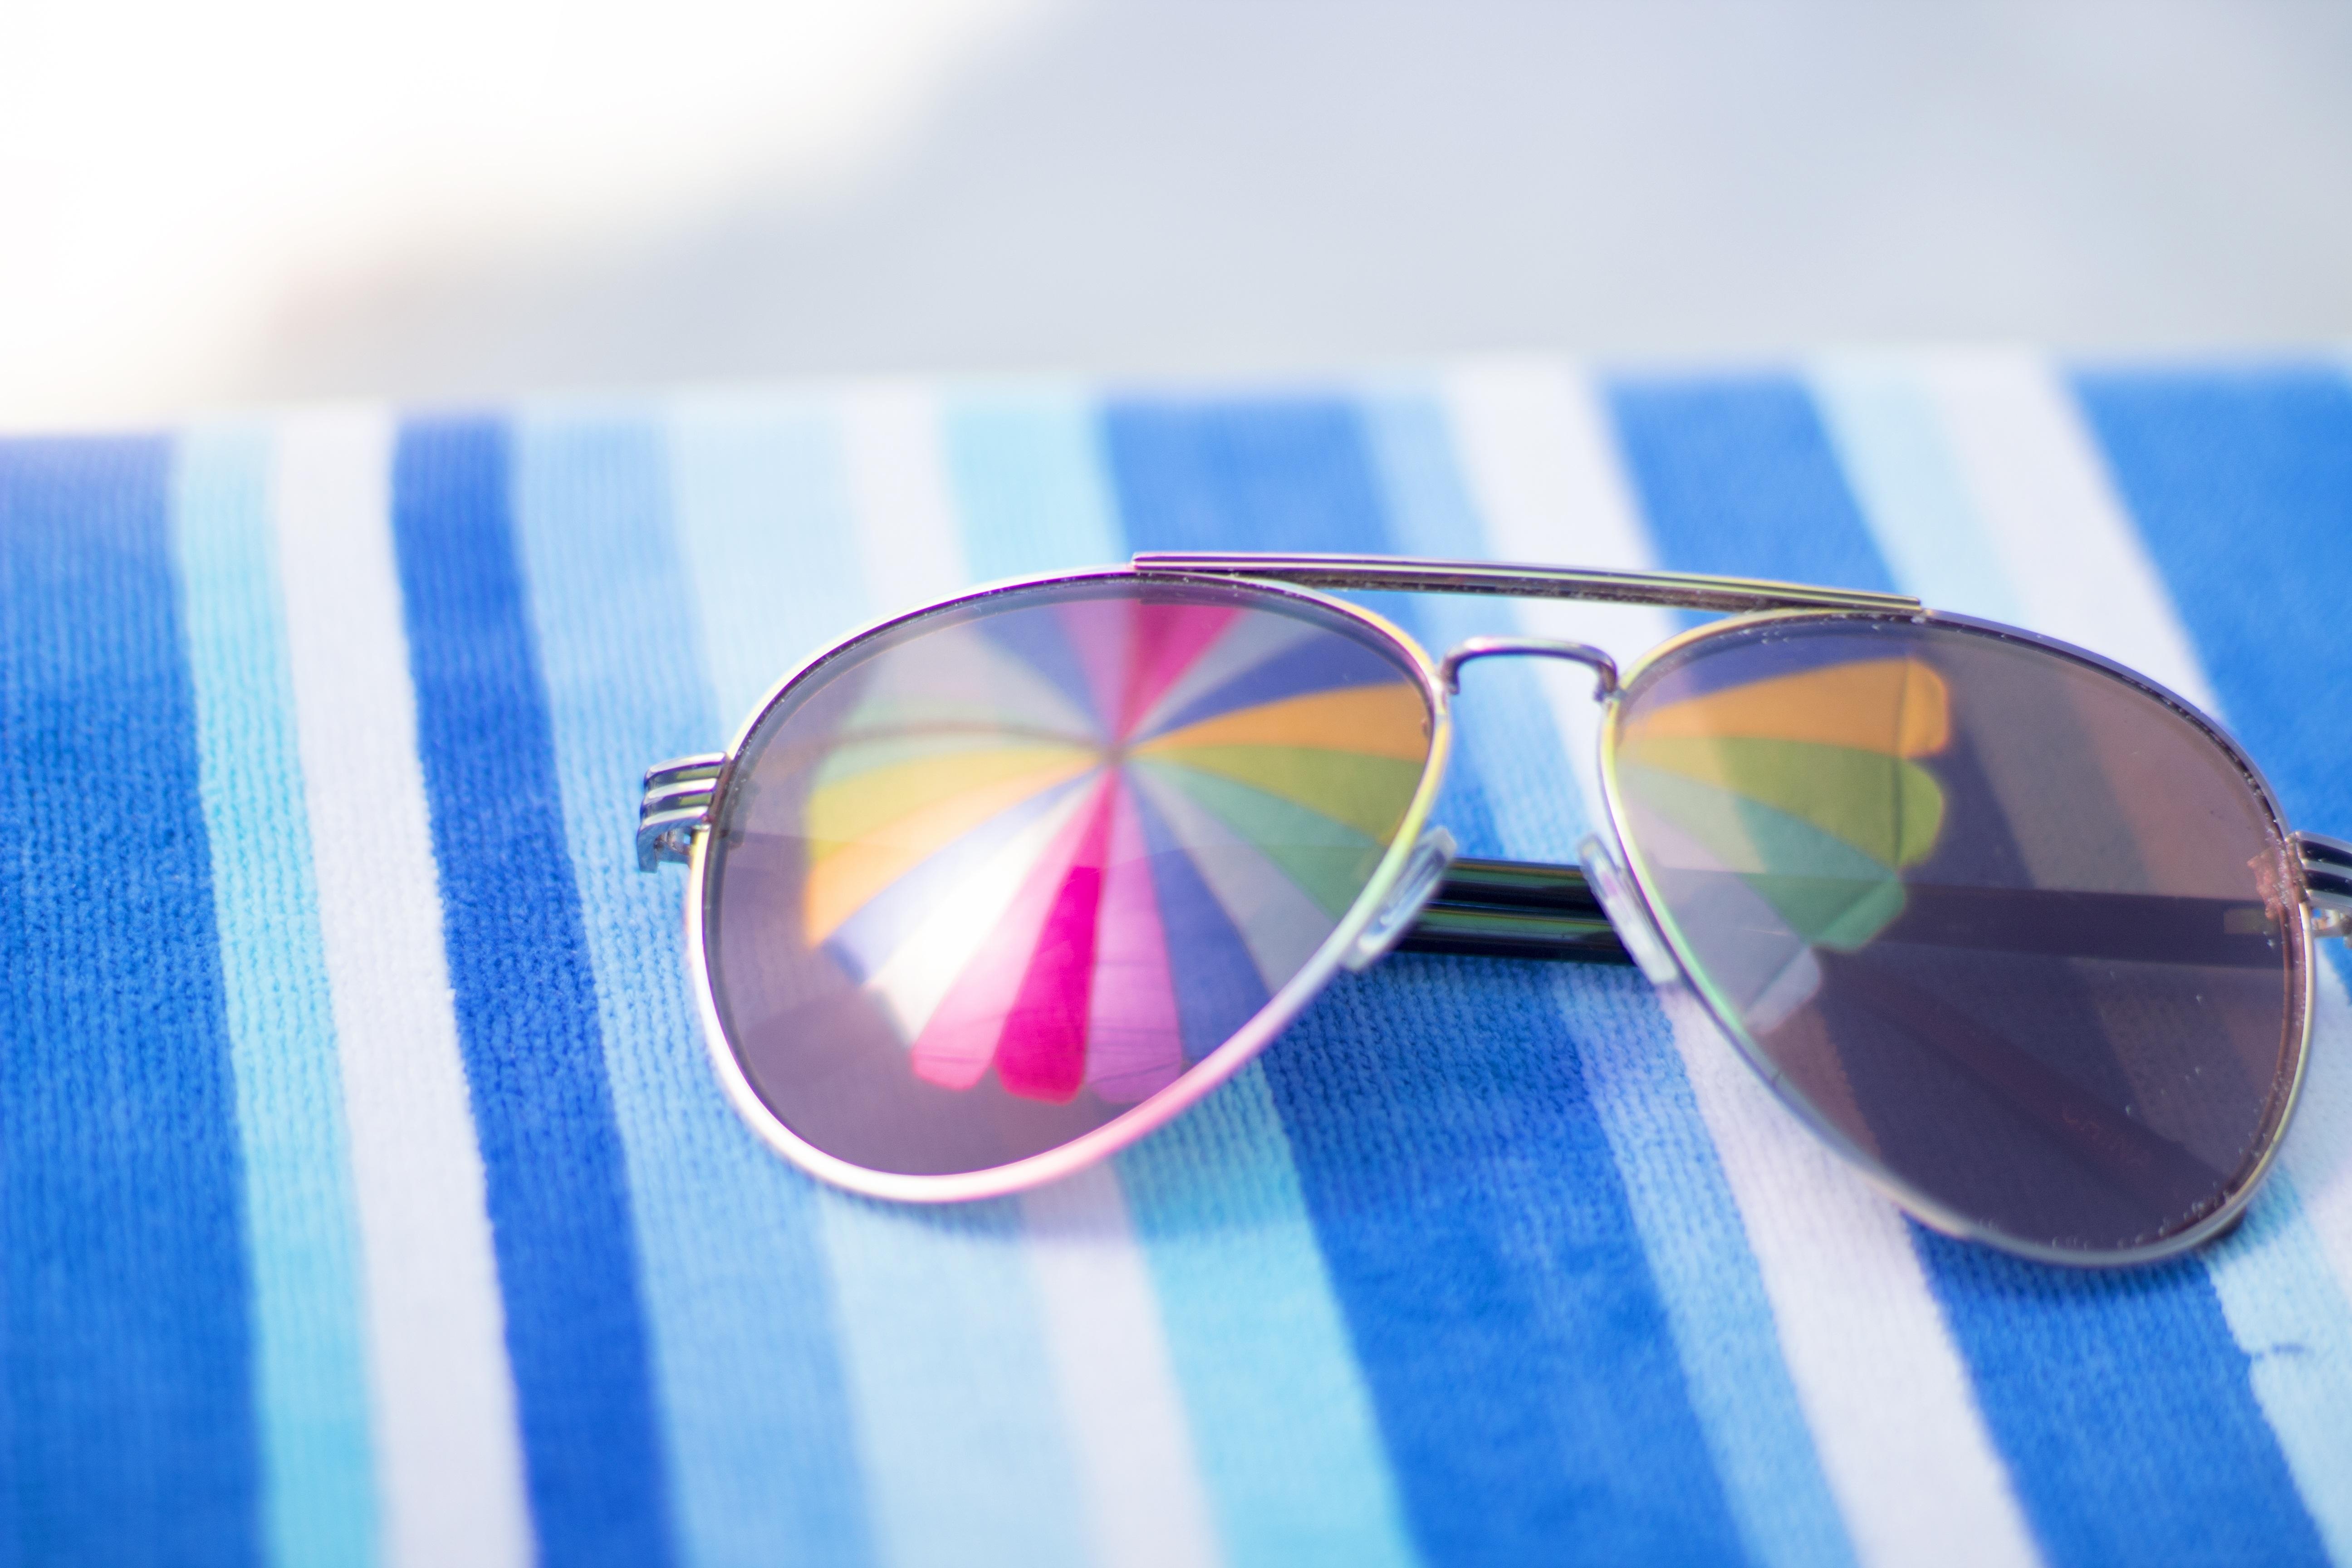 Summer Fun >> Free Images : sea, coast, water, nature, outdoor, sand, ocean, people, sky, sun, shore, summer ...